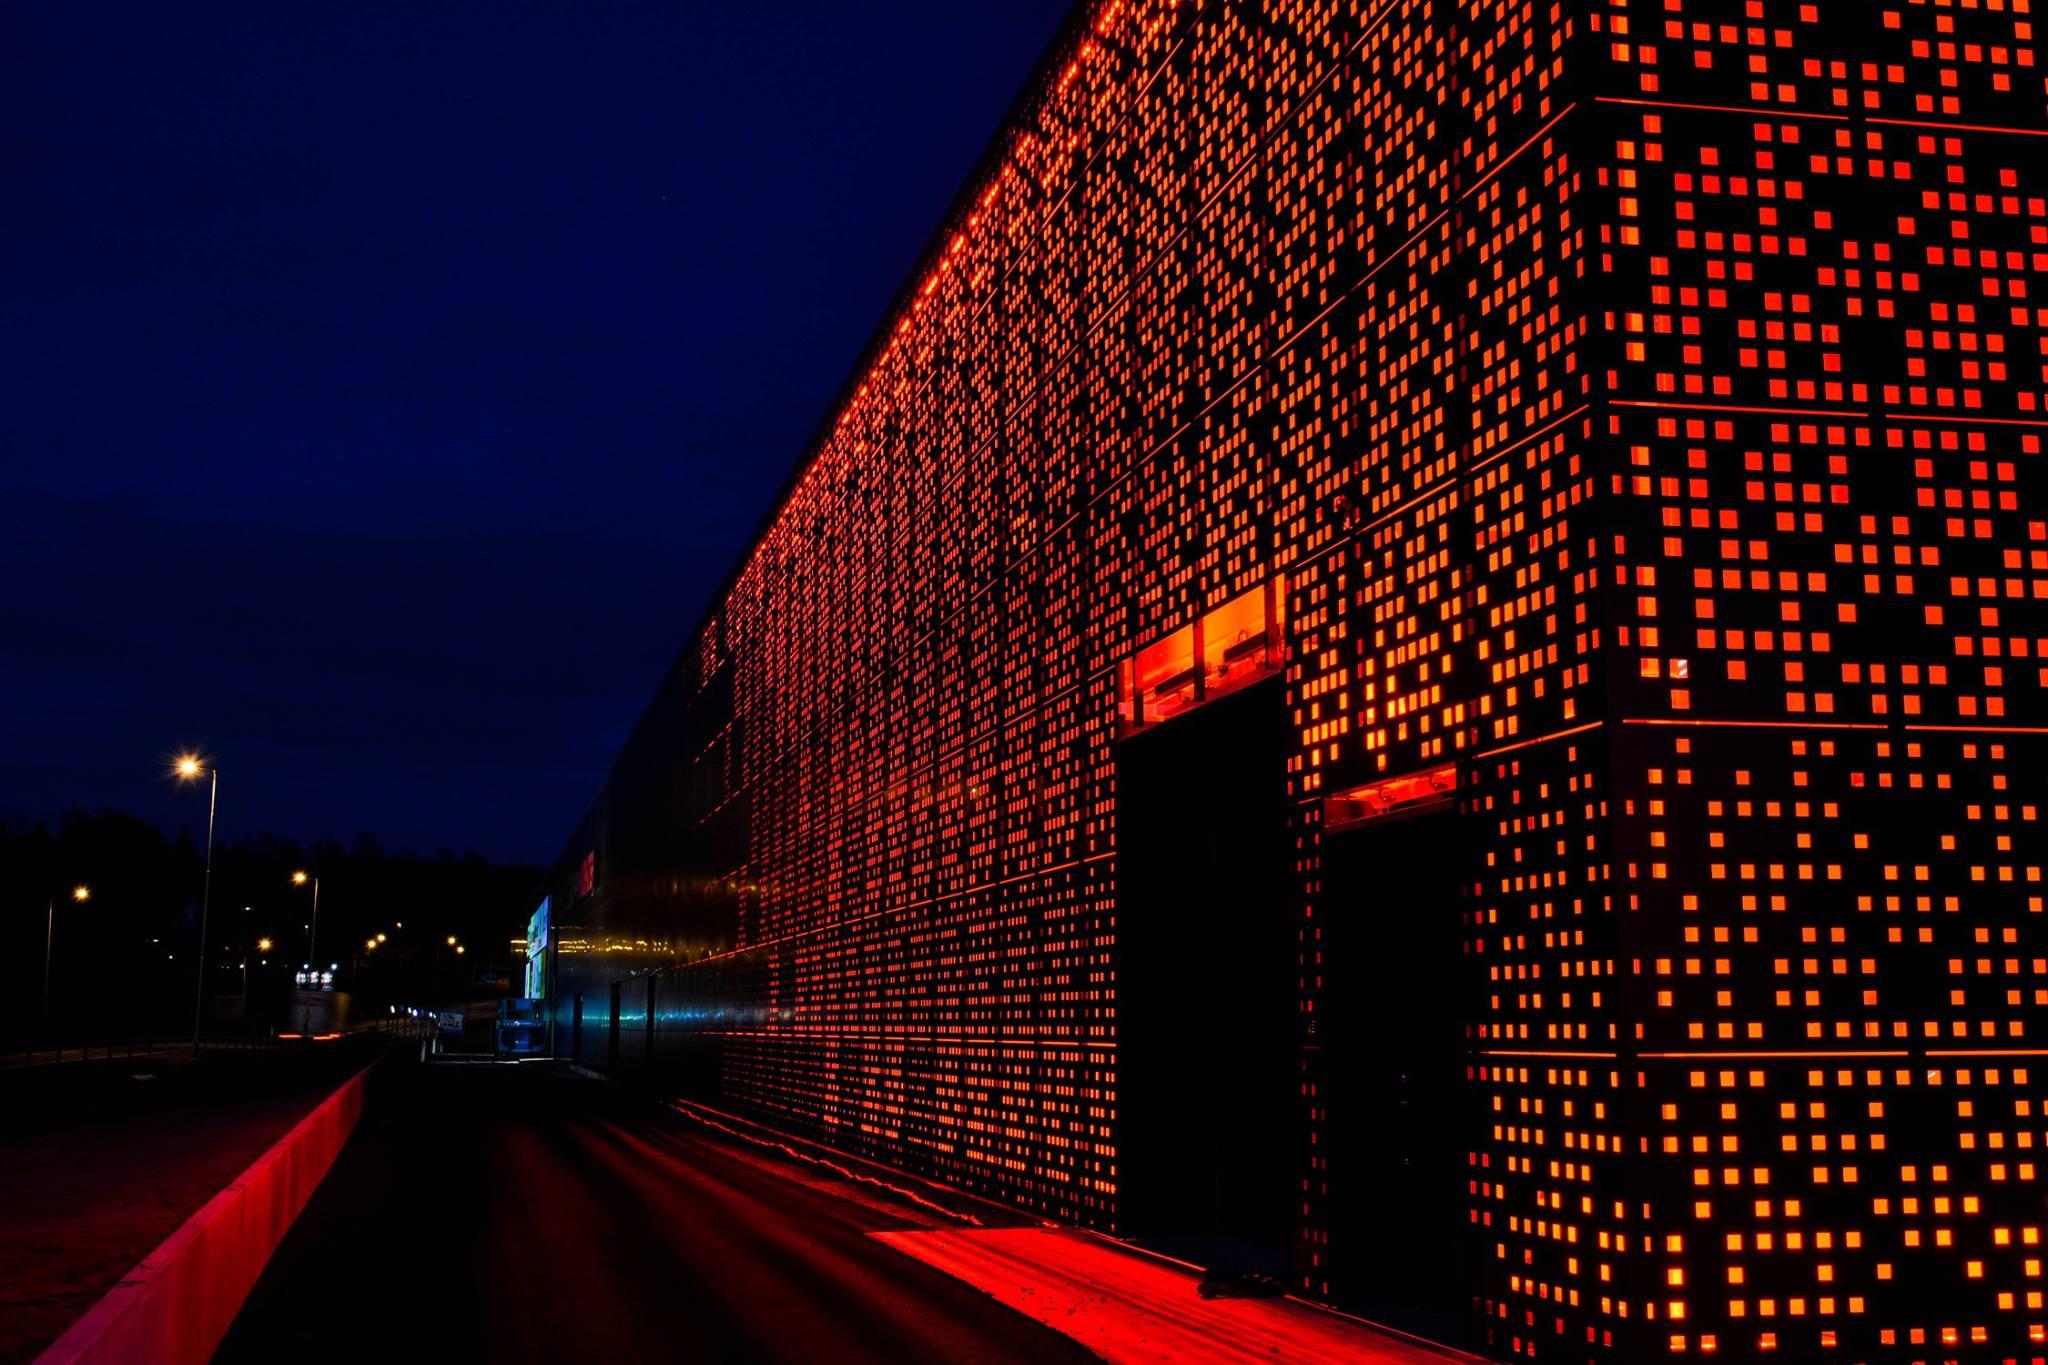 Griven utebelysning på Töckfors Shoppingcenter